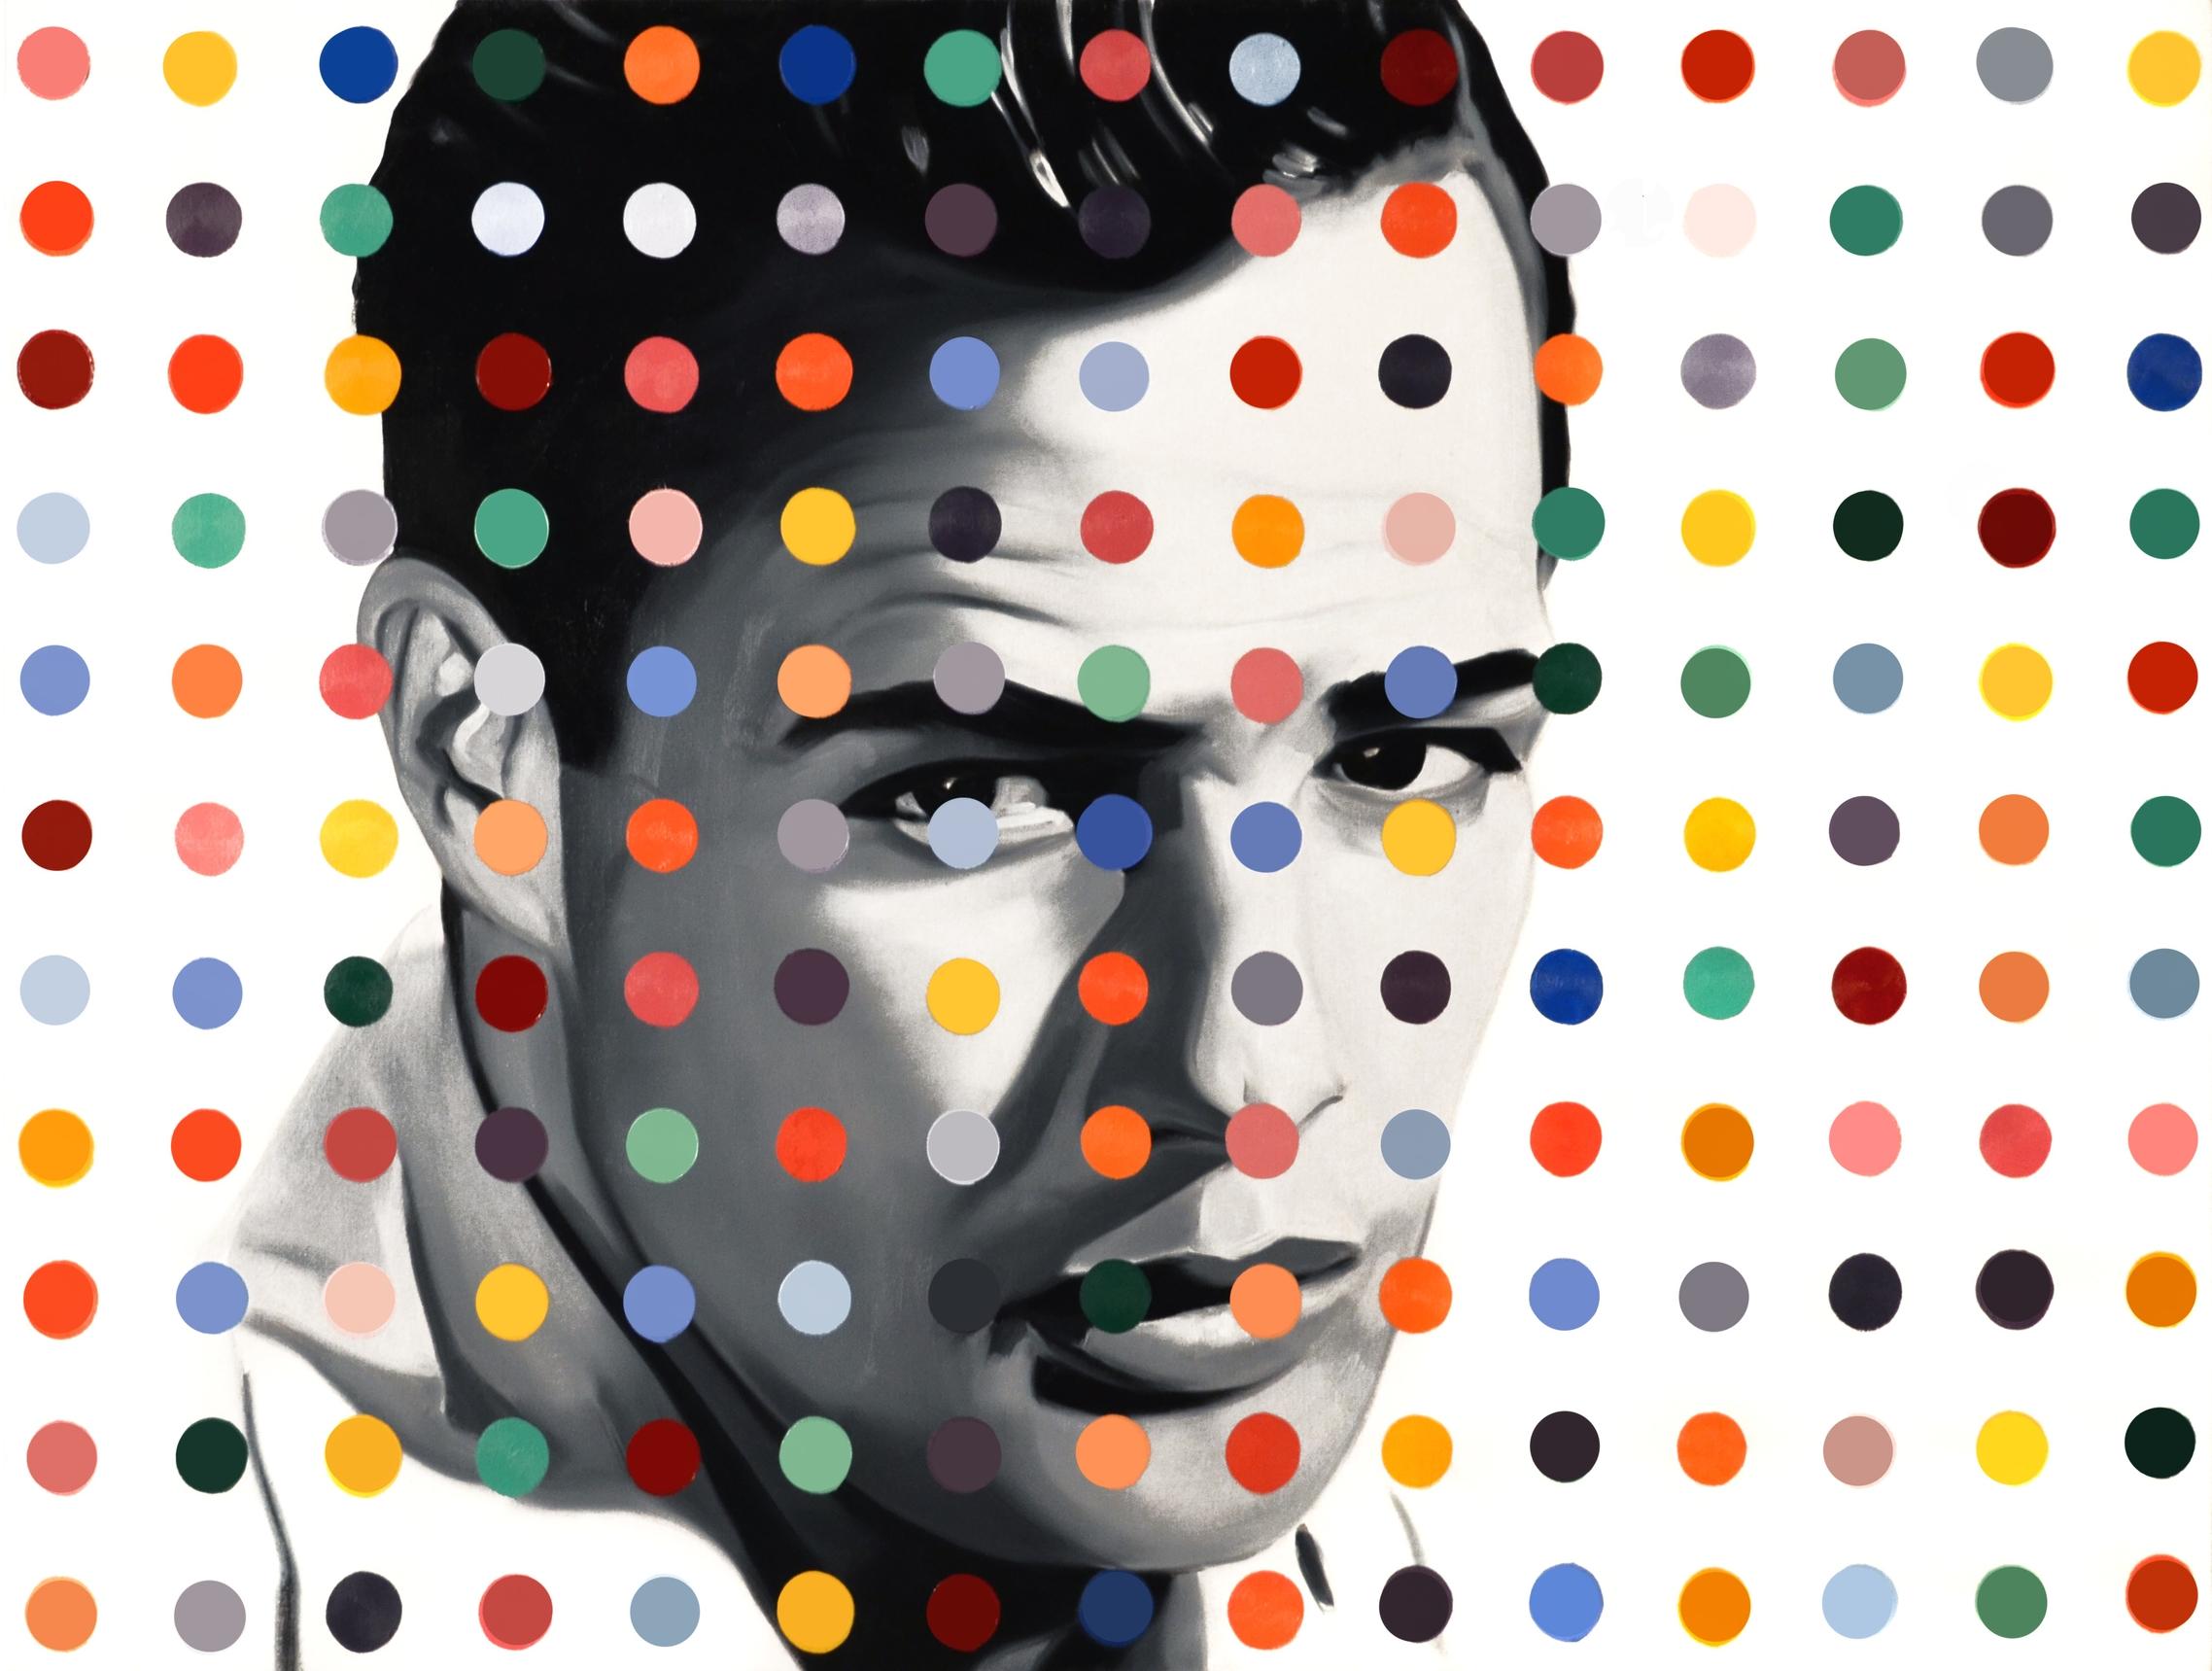 Marlon Dot  Oil on Canvas - 30 x 40in - 2013